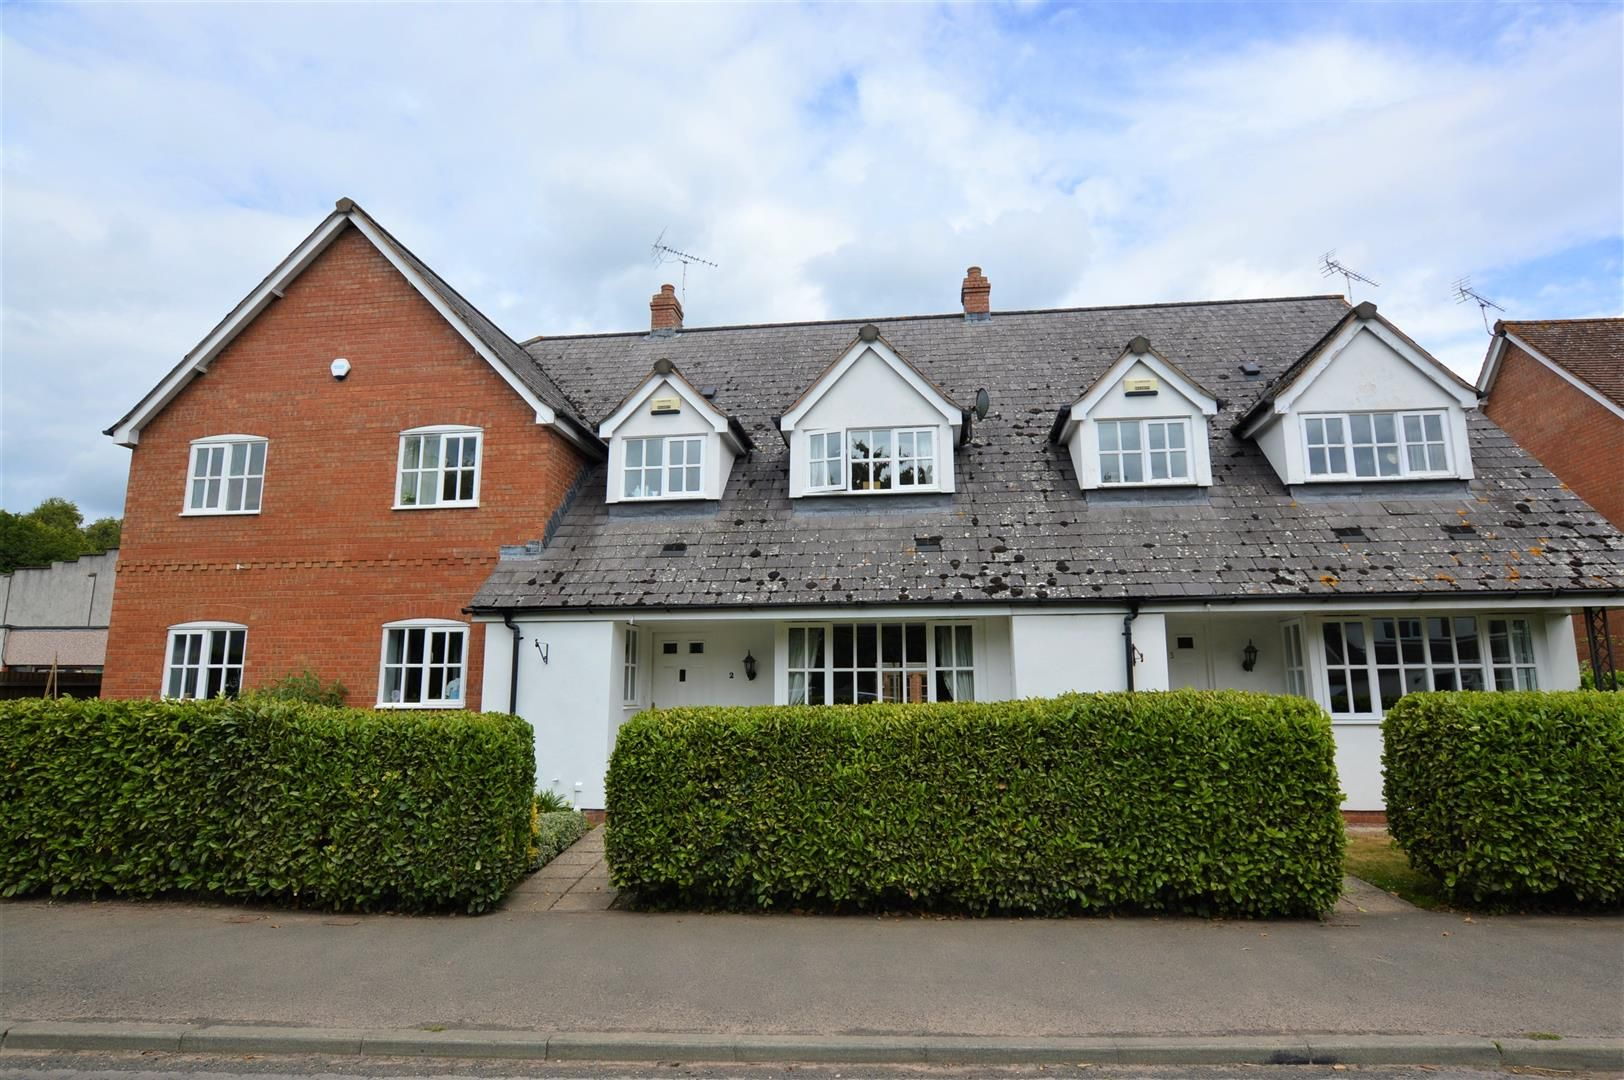 3 bed terraced for sale in Eardisley  - Property Image 1